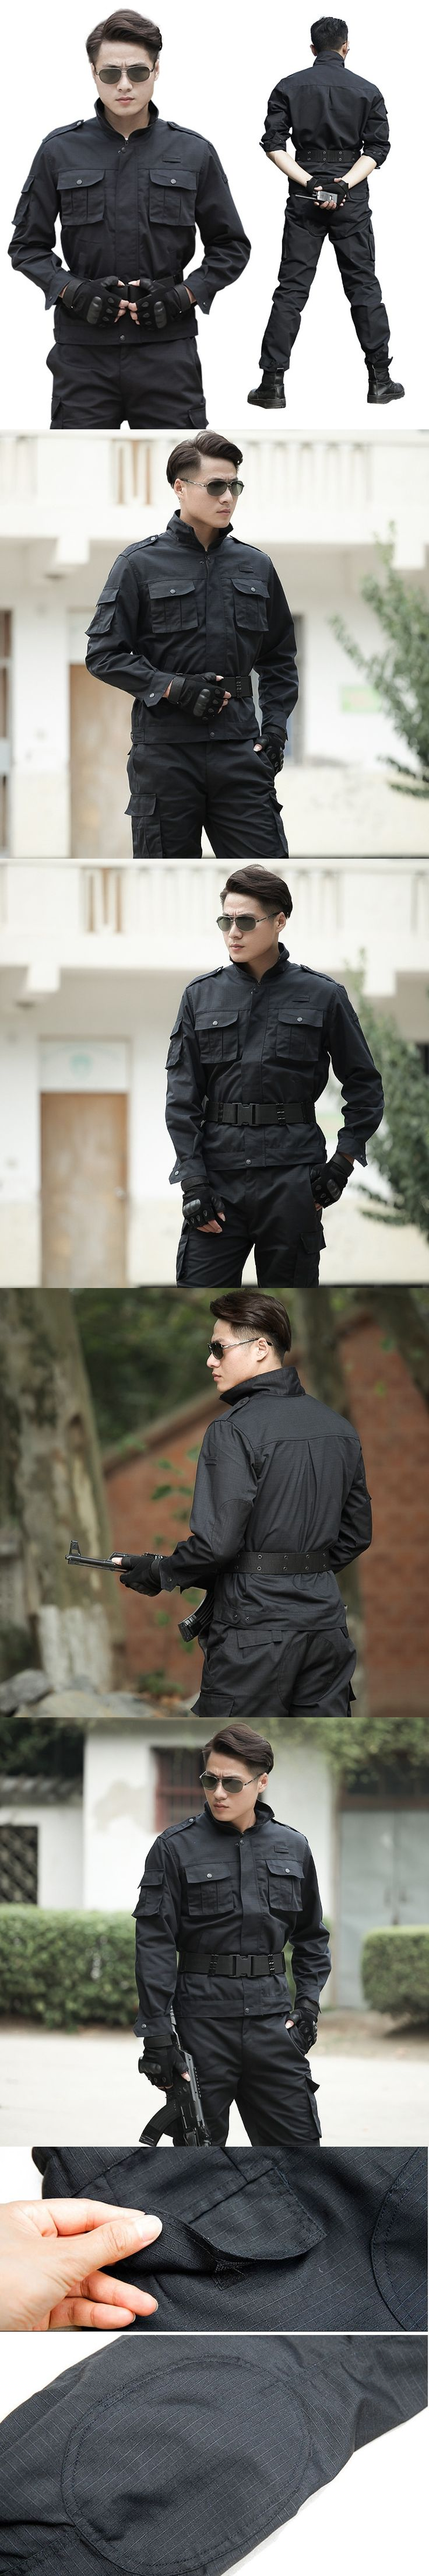 Men Military Tactical Uniform Suit Special Forces Militar Combat Clothing Security Uniforms Male Working Clothes Jacket + Pants